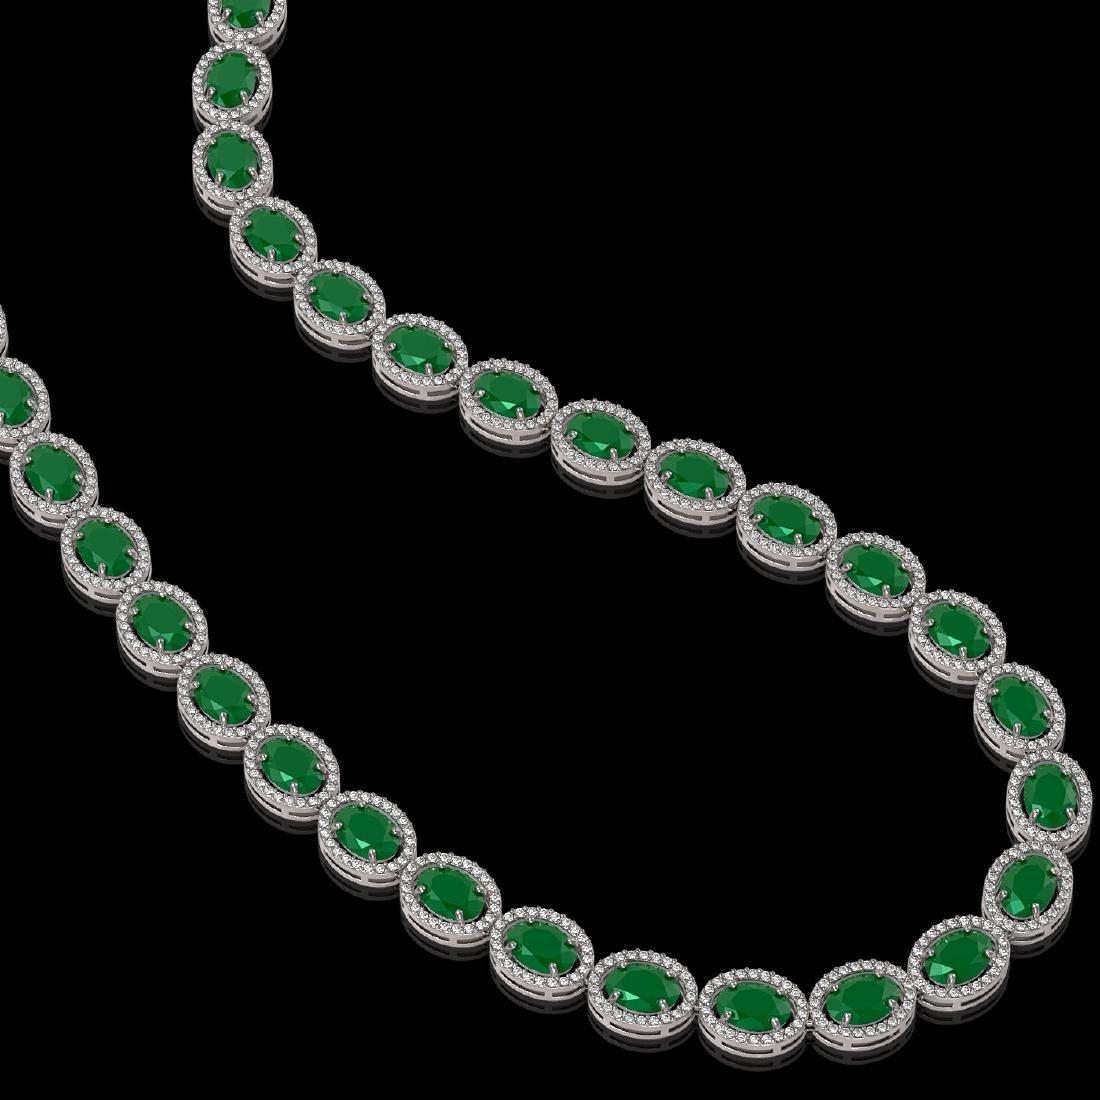 52.15 CTW Emerald & Diamond Halo Necklace 10K White - 2